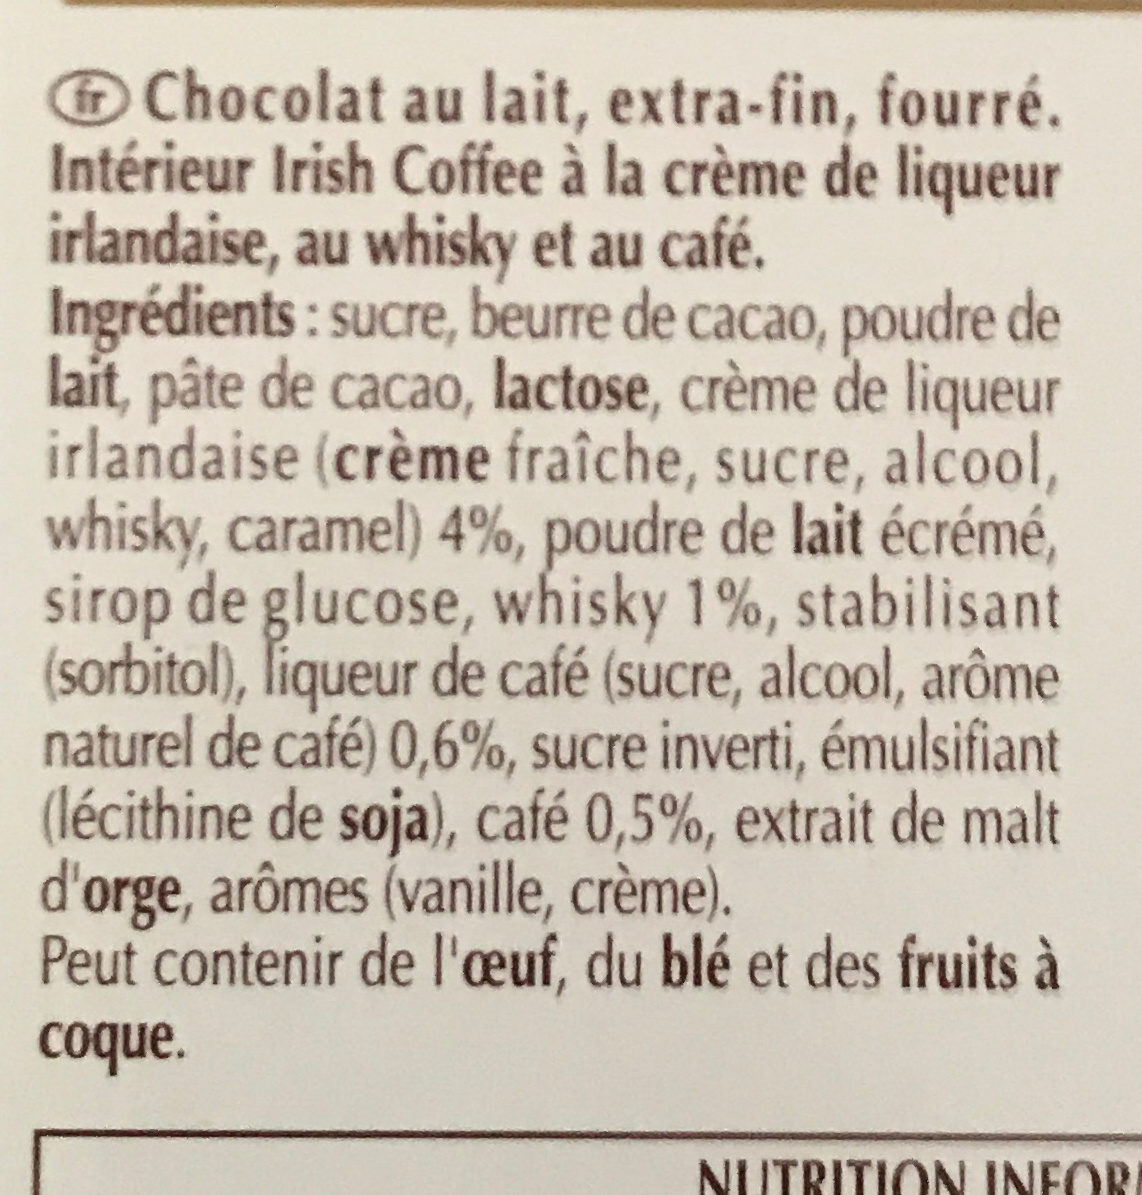 Creation Irish Coffee au Whisky - Ingredients